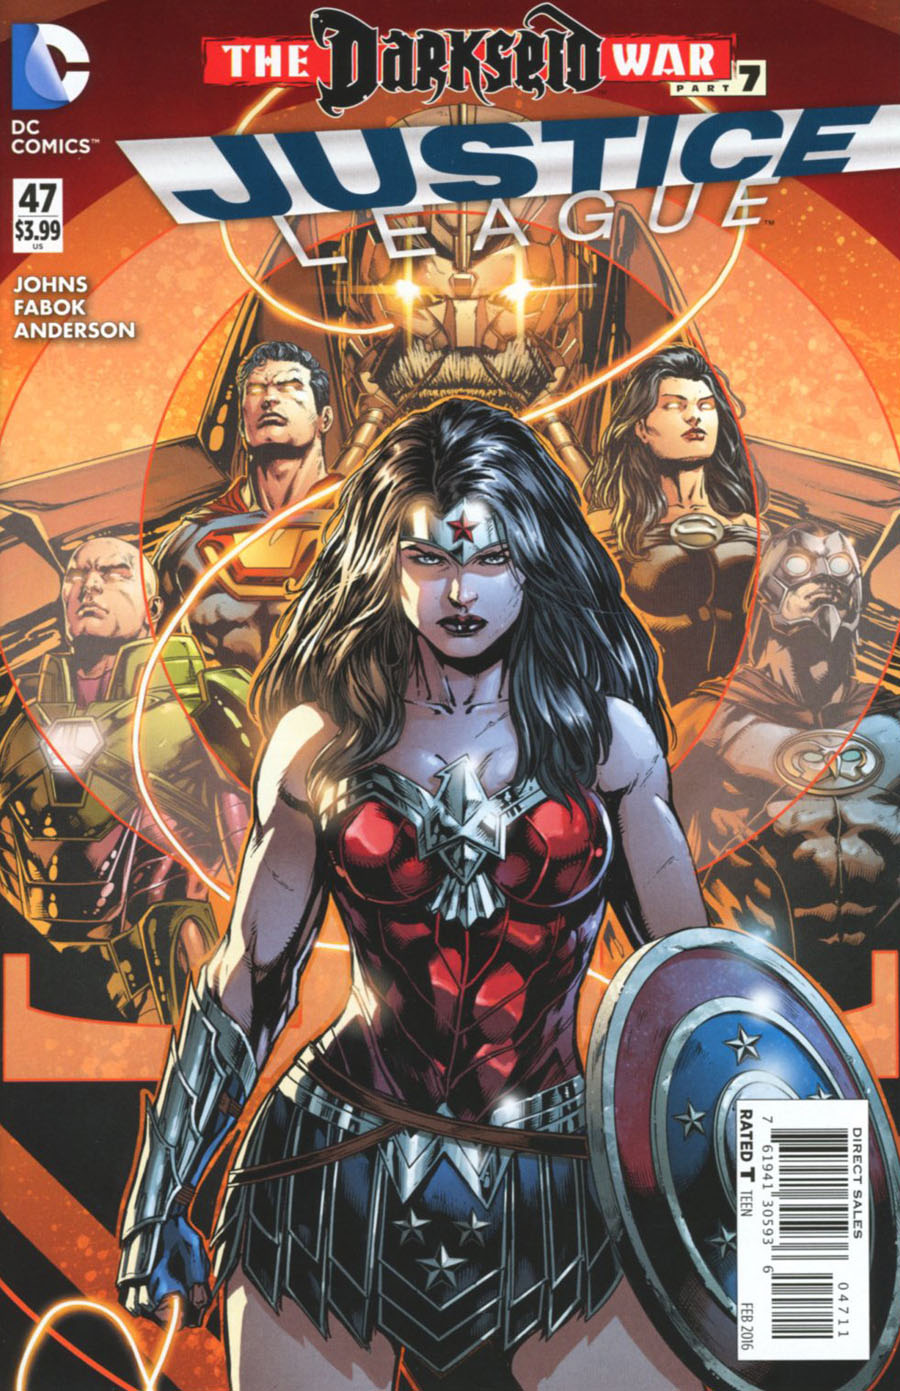 Justice League Vol 2 #47 Cover A Regular Jason Fabok Cover